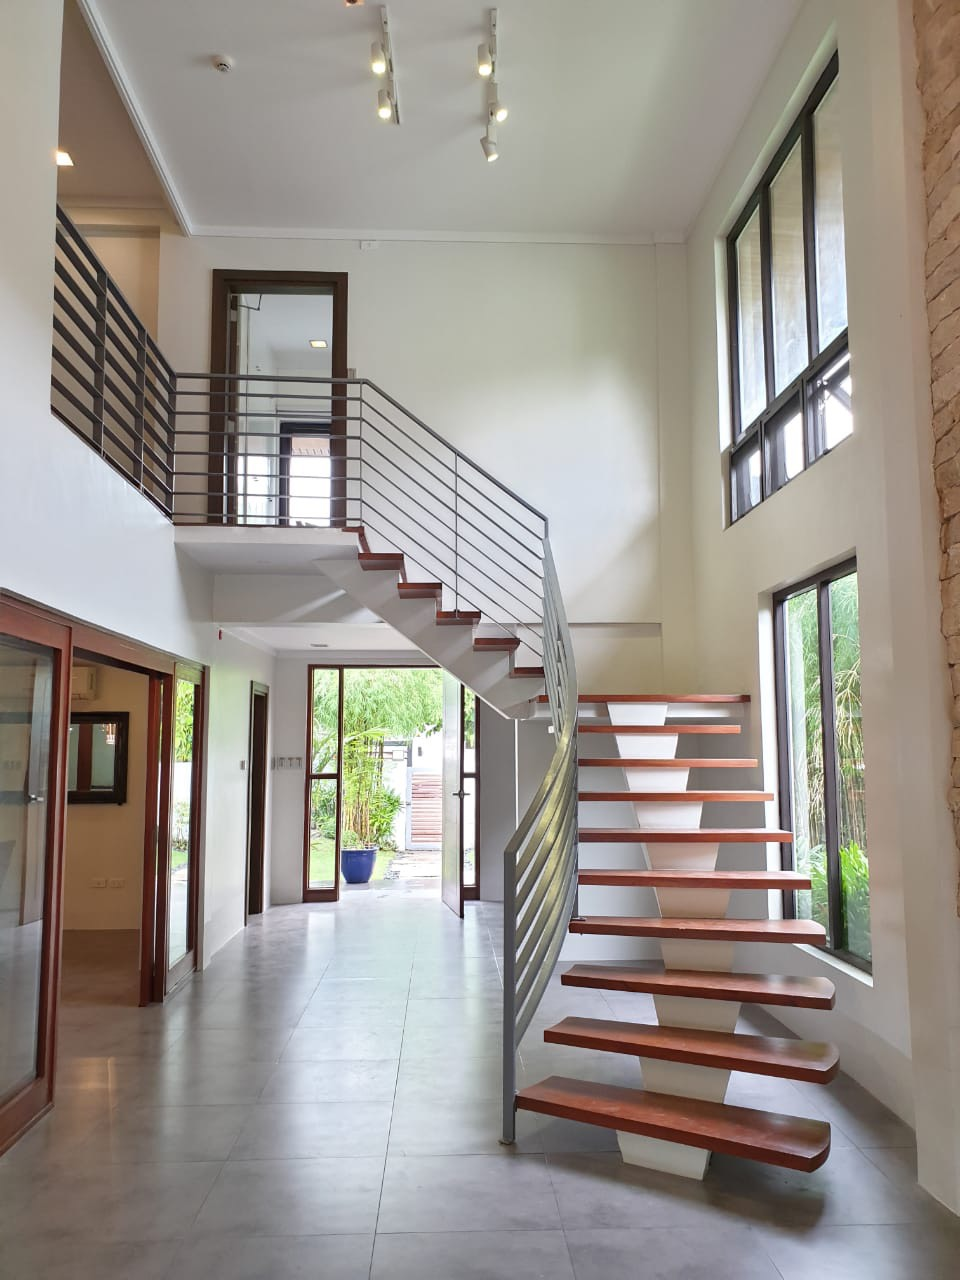 4 Bedrooms House For Sale, Ayala Alabang 6